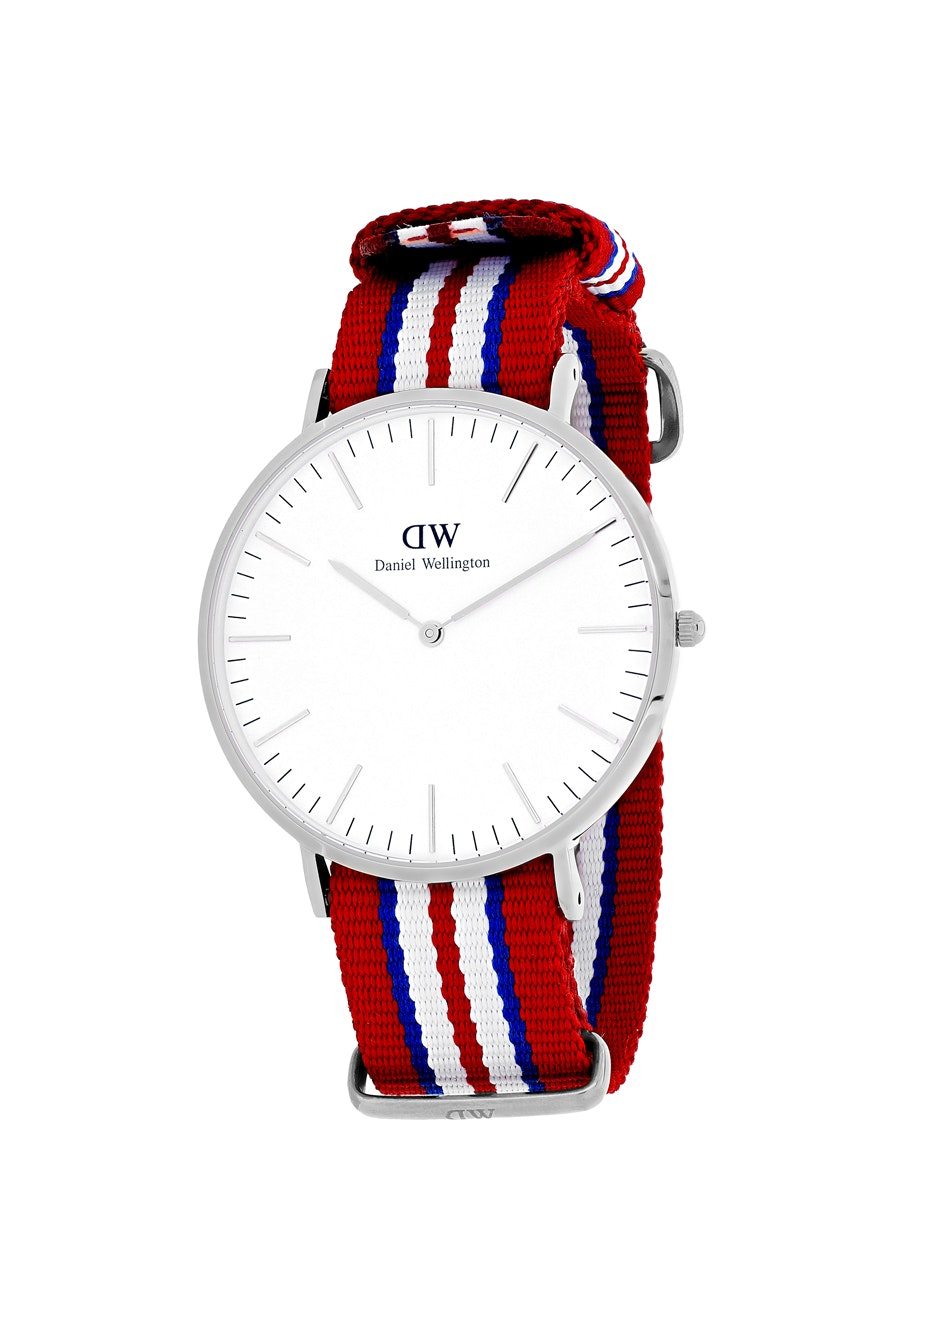 Daniel Wellington Men's Classic Exceter - White/Tri-tone Red, B